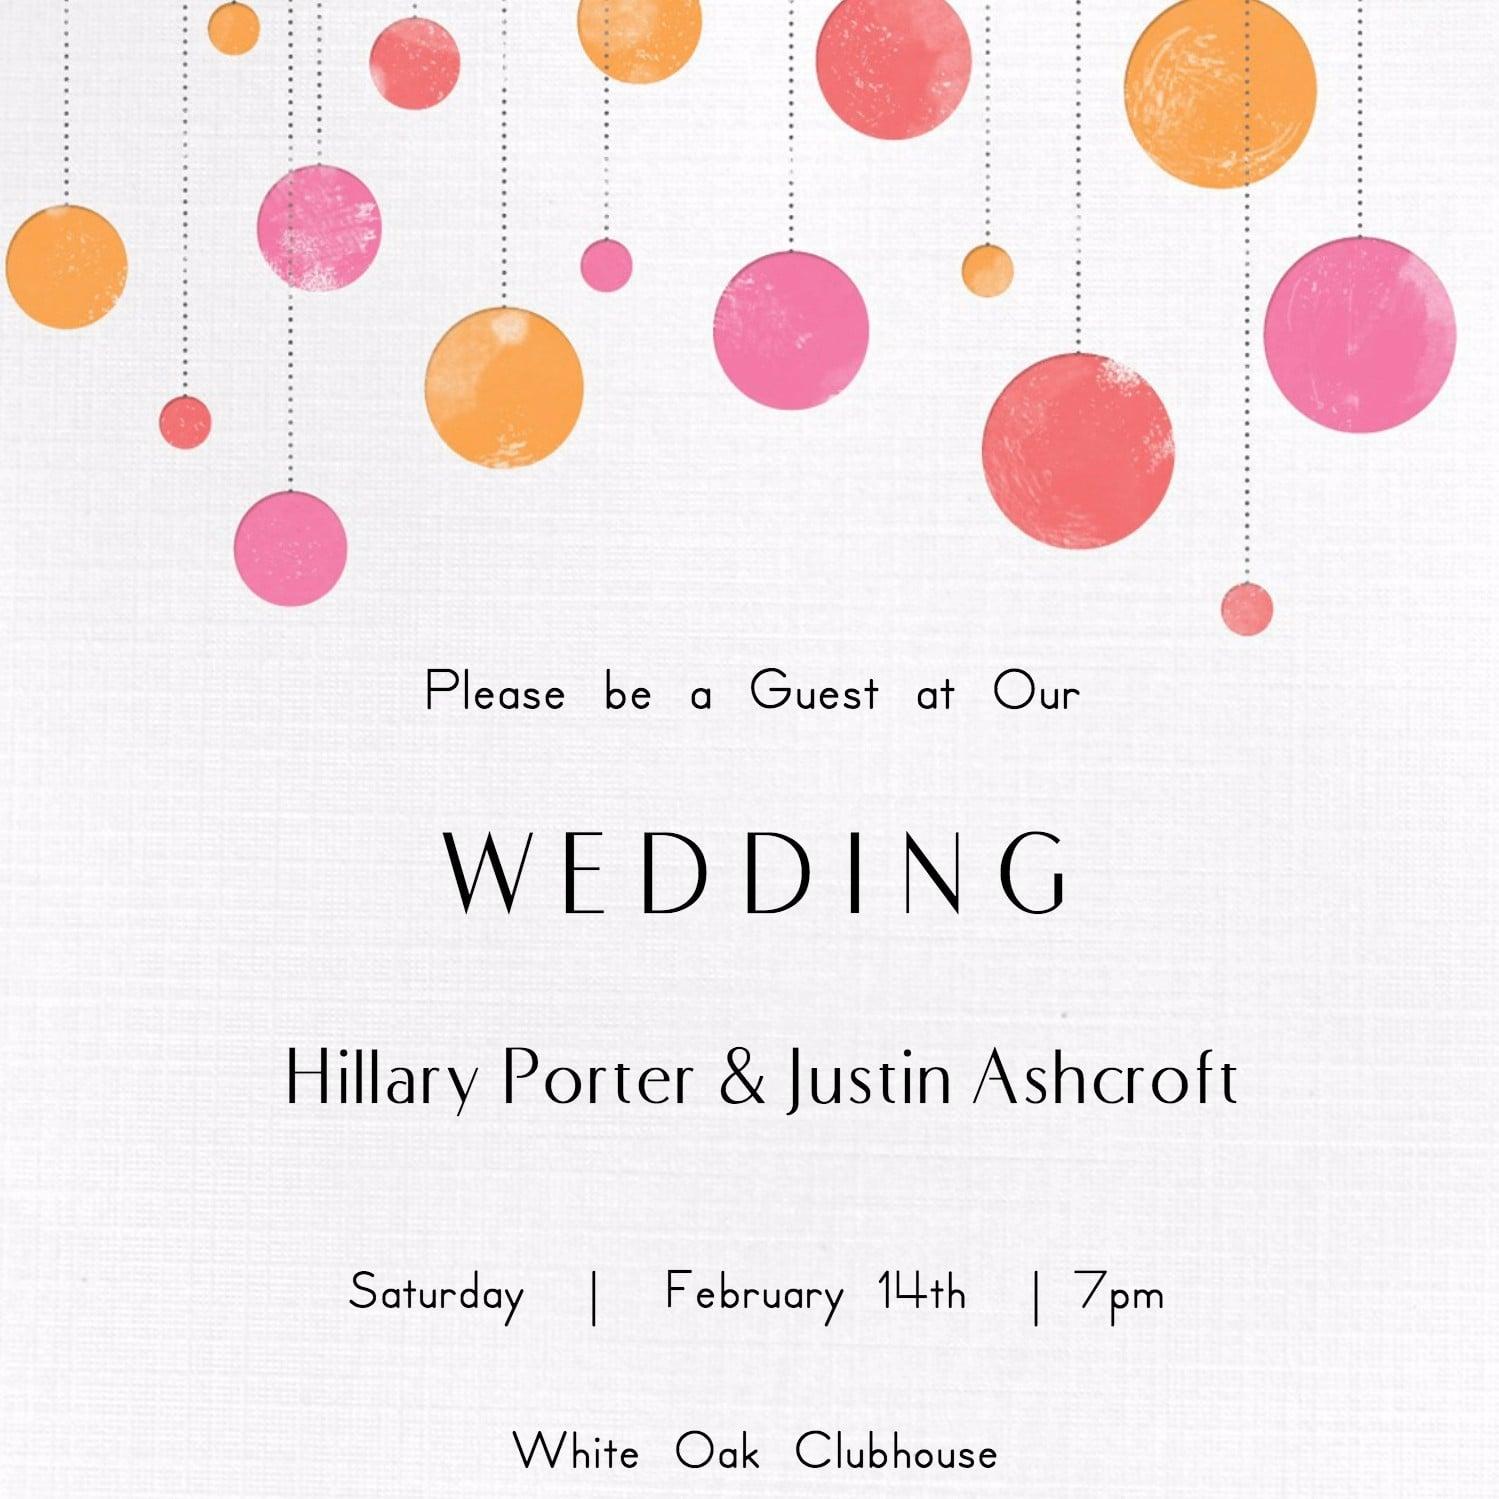 Free Printable Wedding Invitations | Popsugar Smart Living - Free Printable Wedding Invitations With Photo